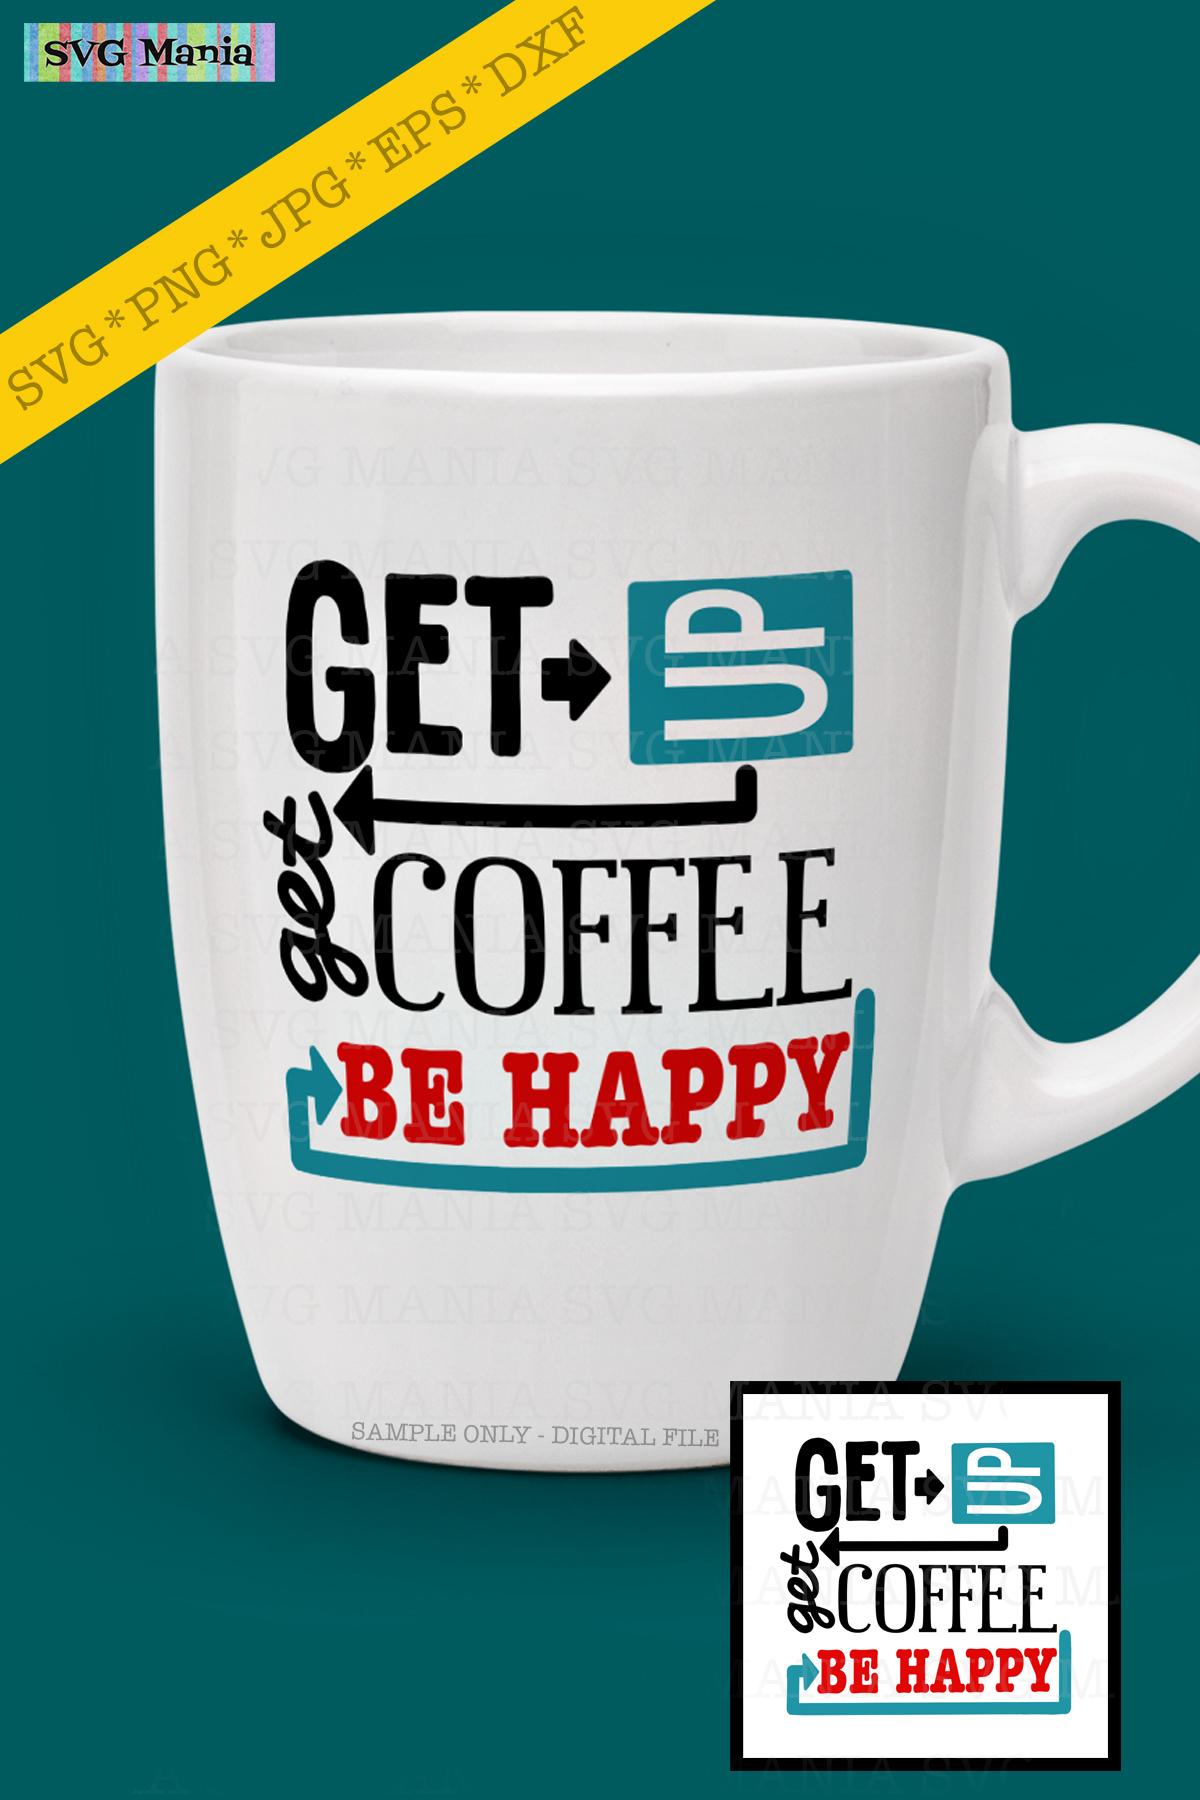 Funny Coffee Mug/Cup SVG File, Coffee Saying SVG, Coffee SVG example image 2